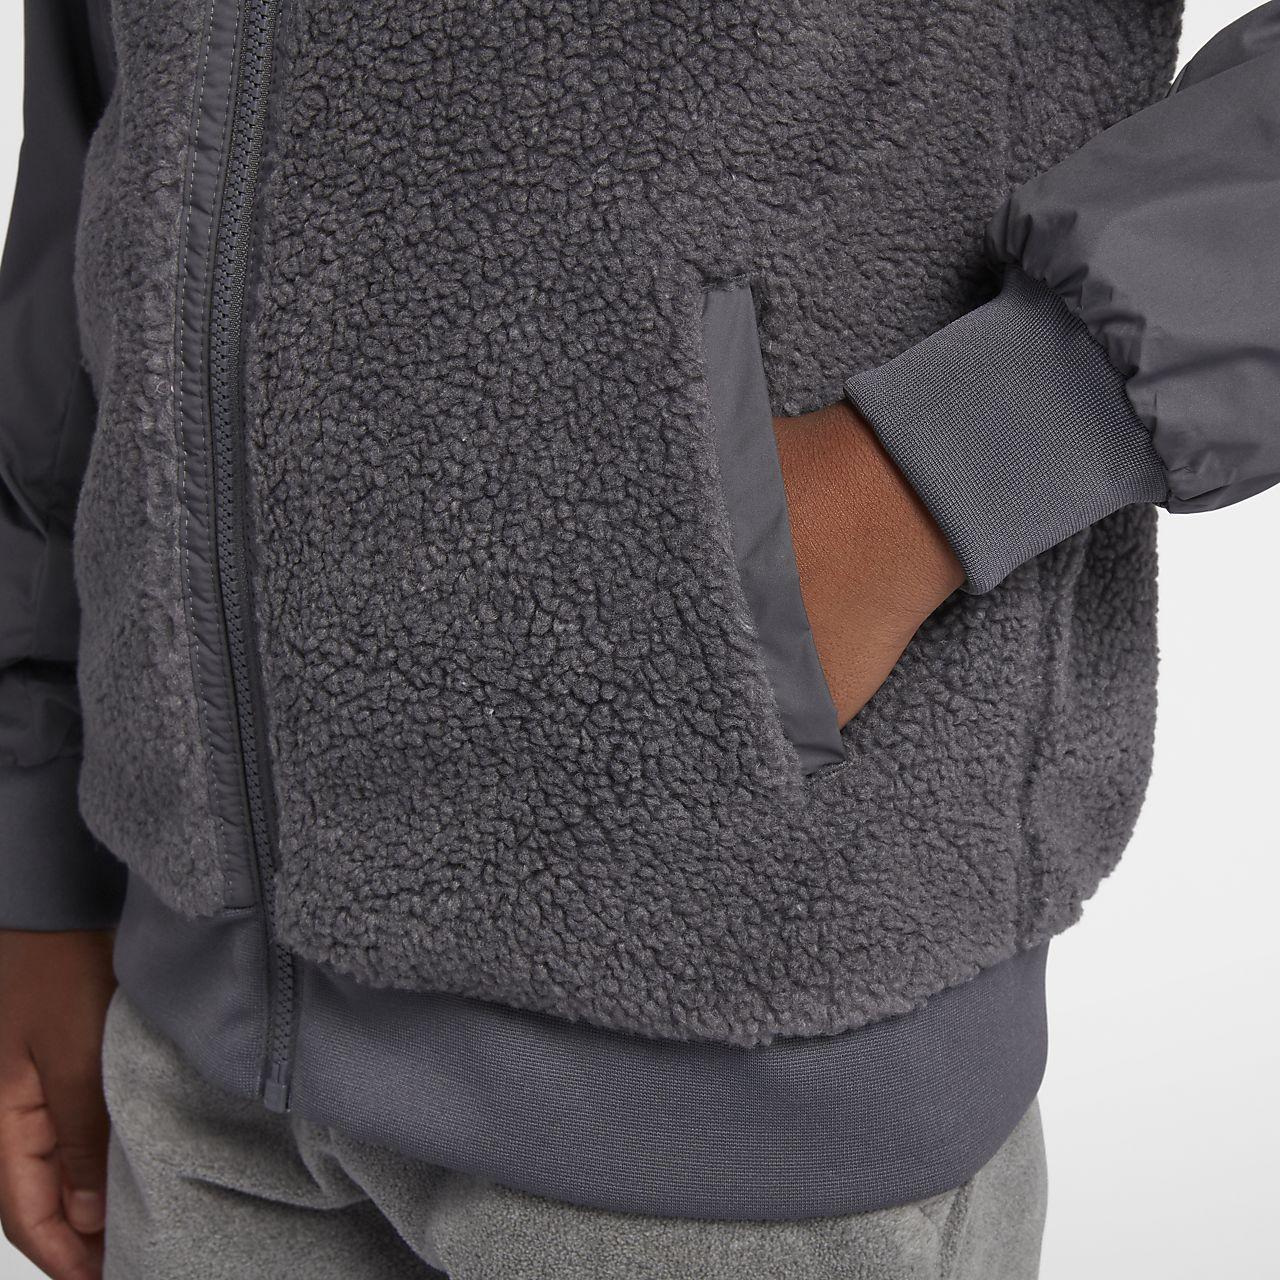 951ad10a1177 Nike Sportswear Windrunner Boys  Sherpa Jacket. Nike.com